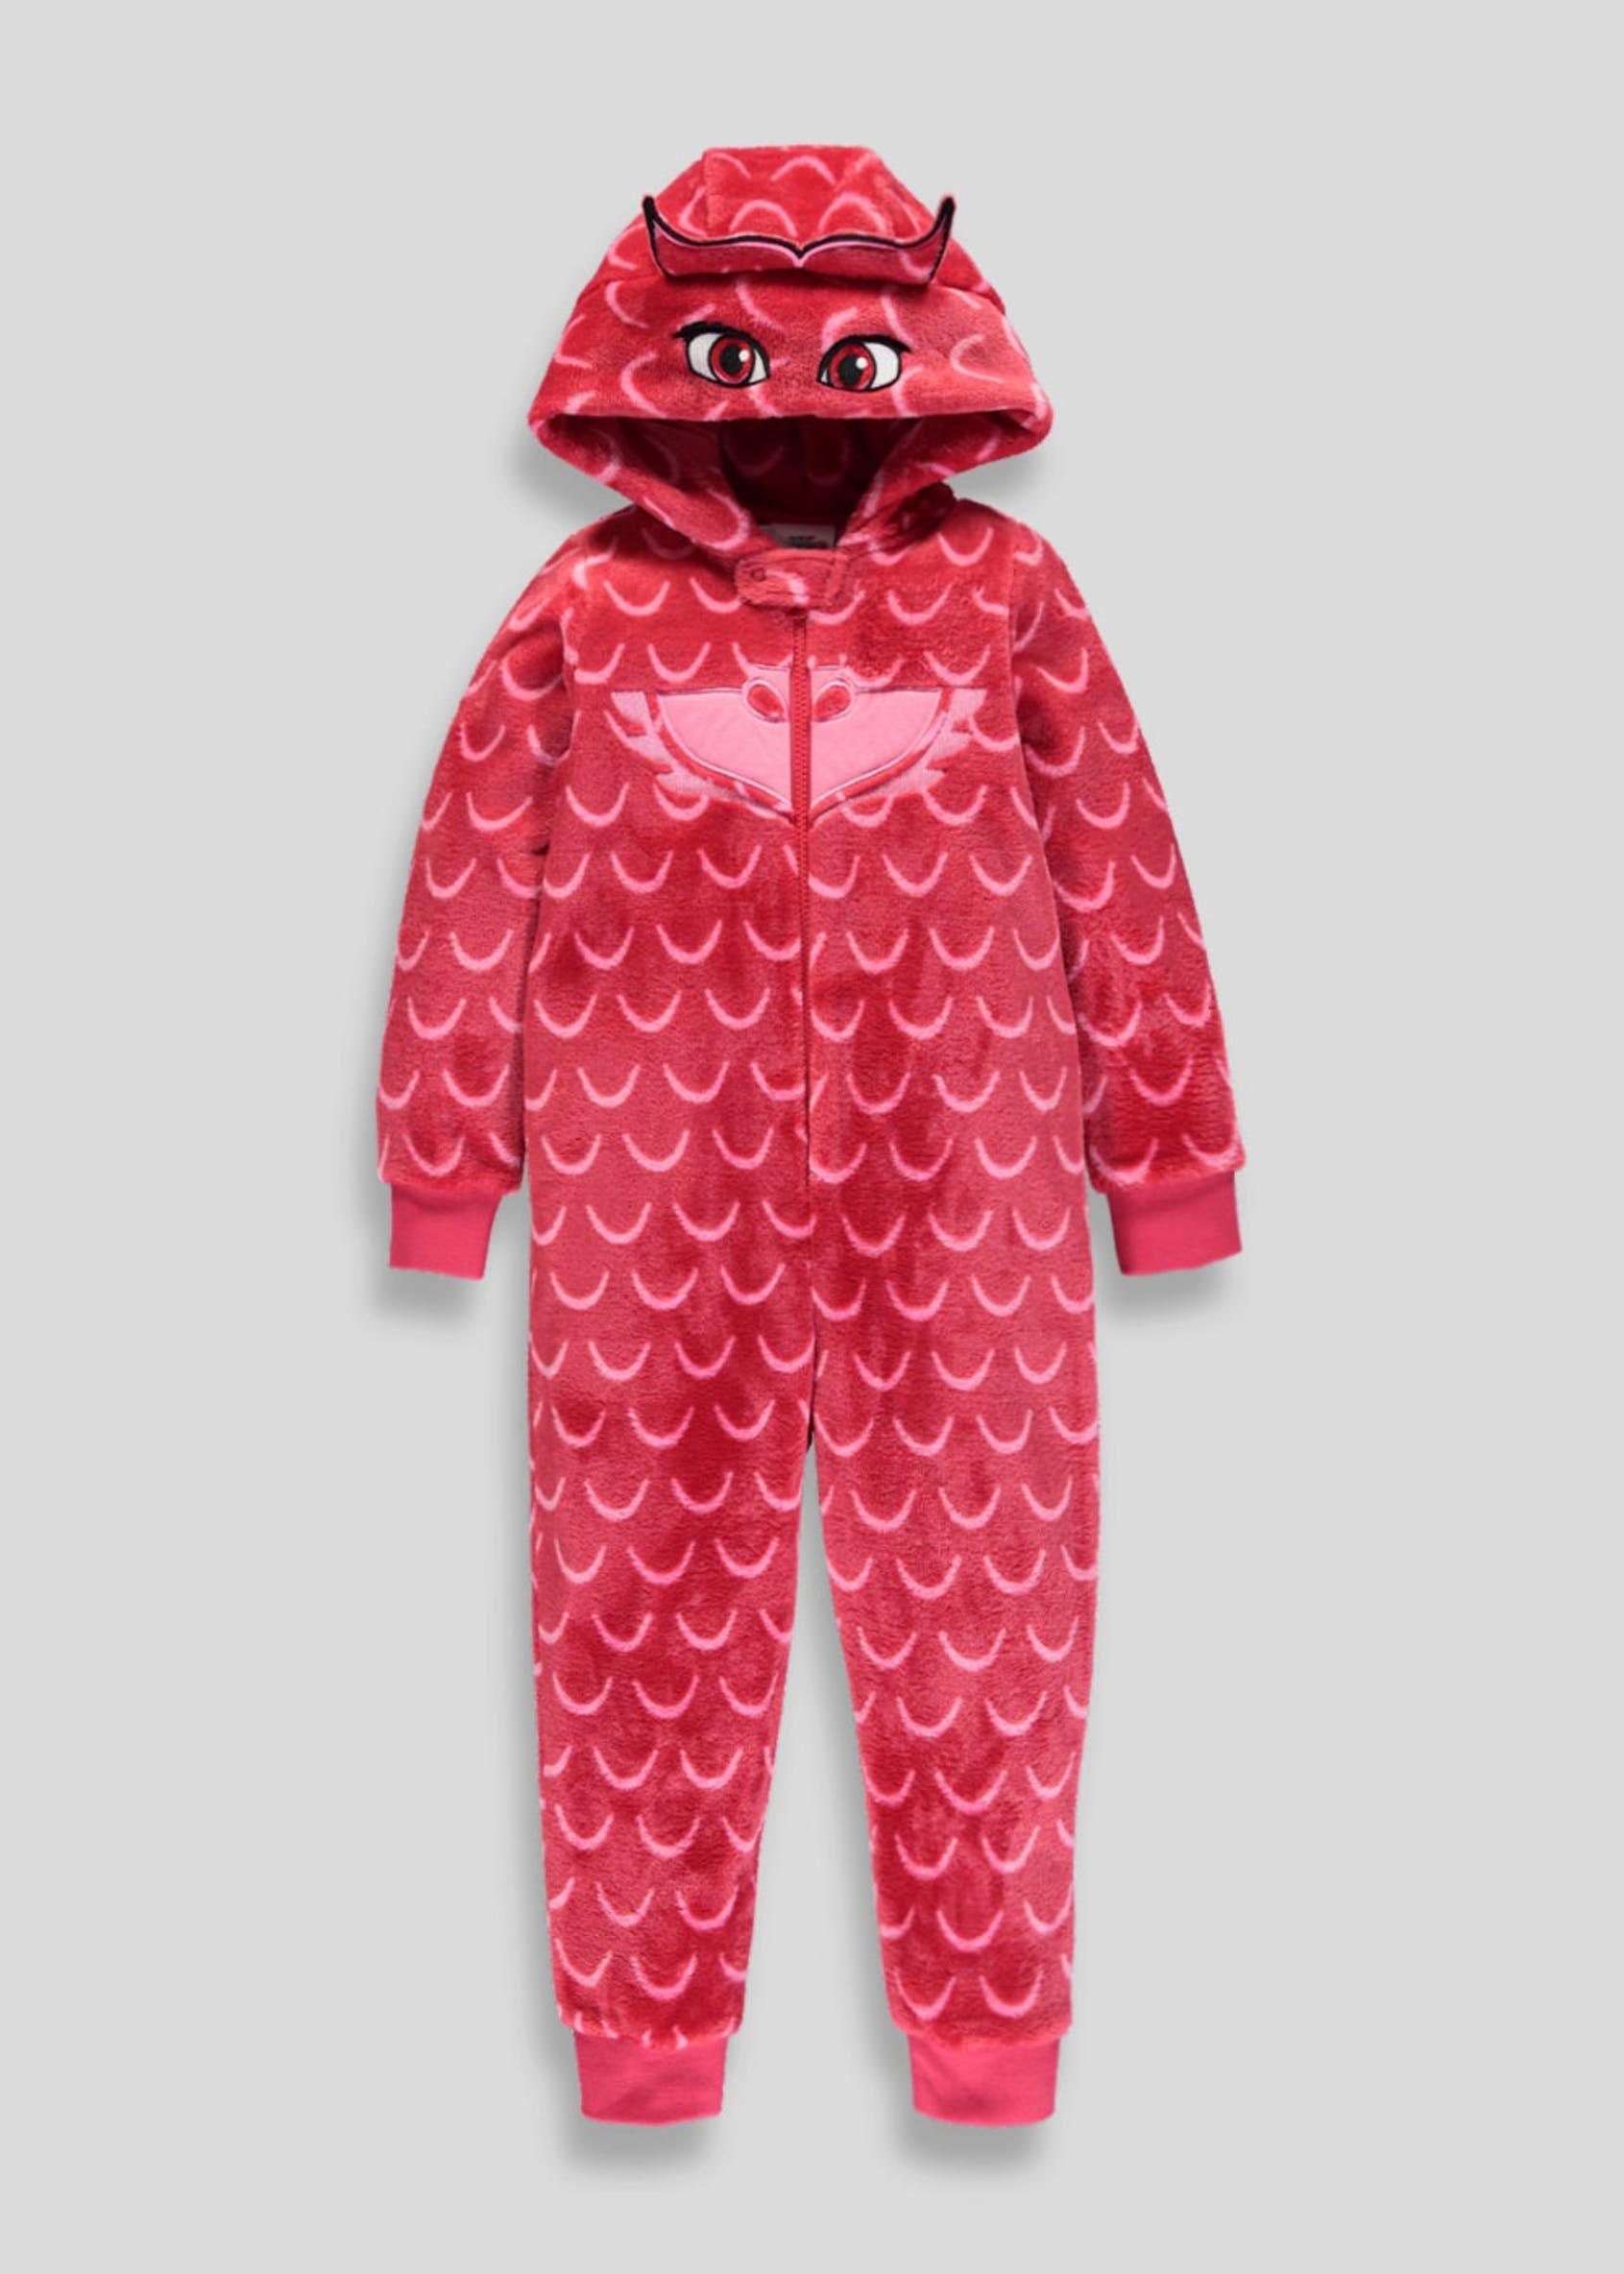 dc8ba826d Kids PJ Masks Owlette Onesie (2-7yrs) – Red